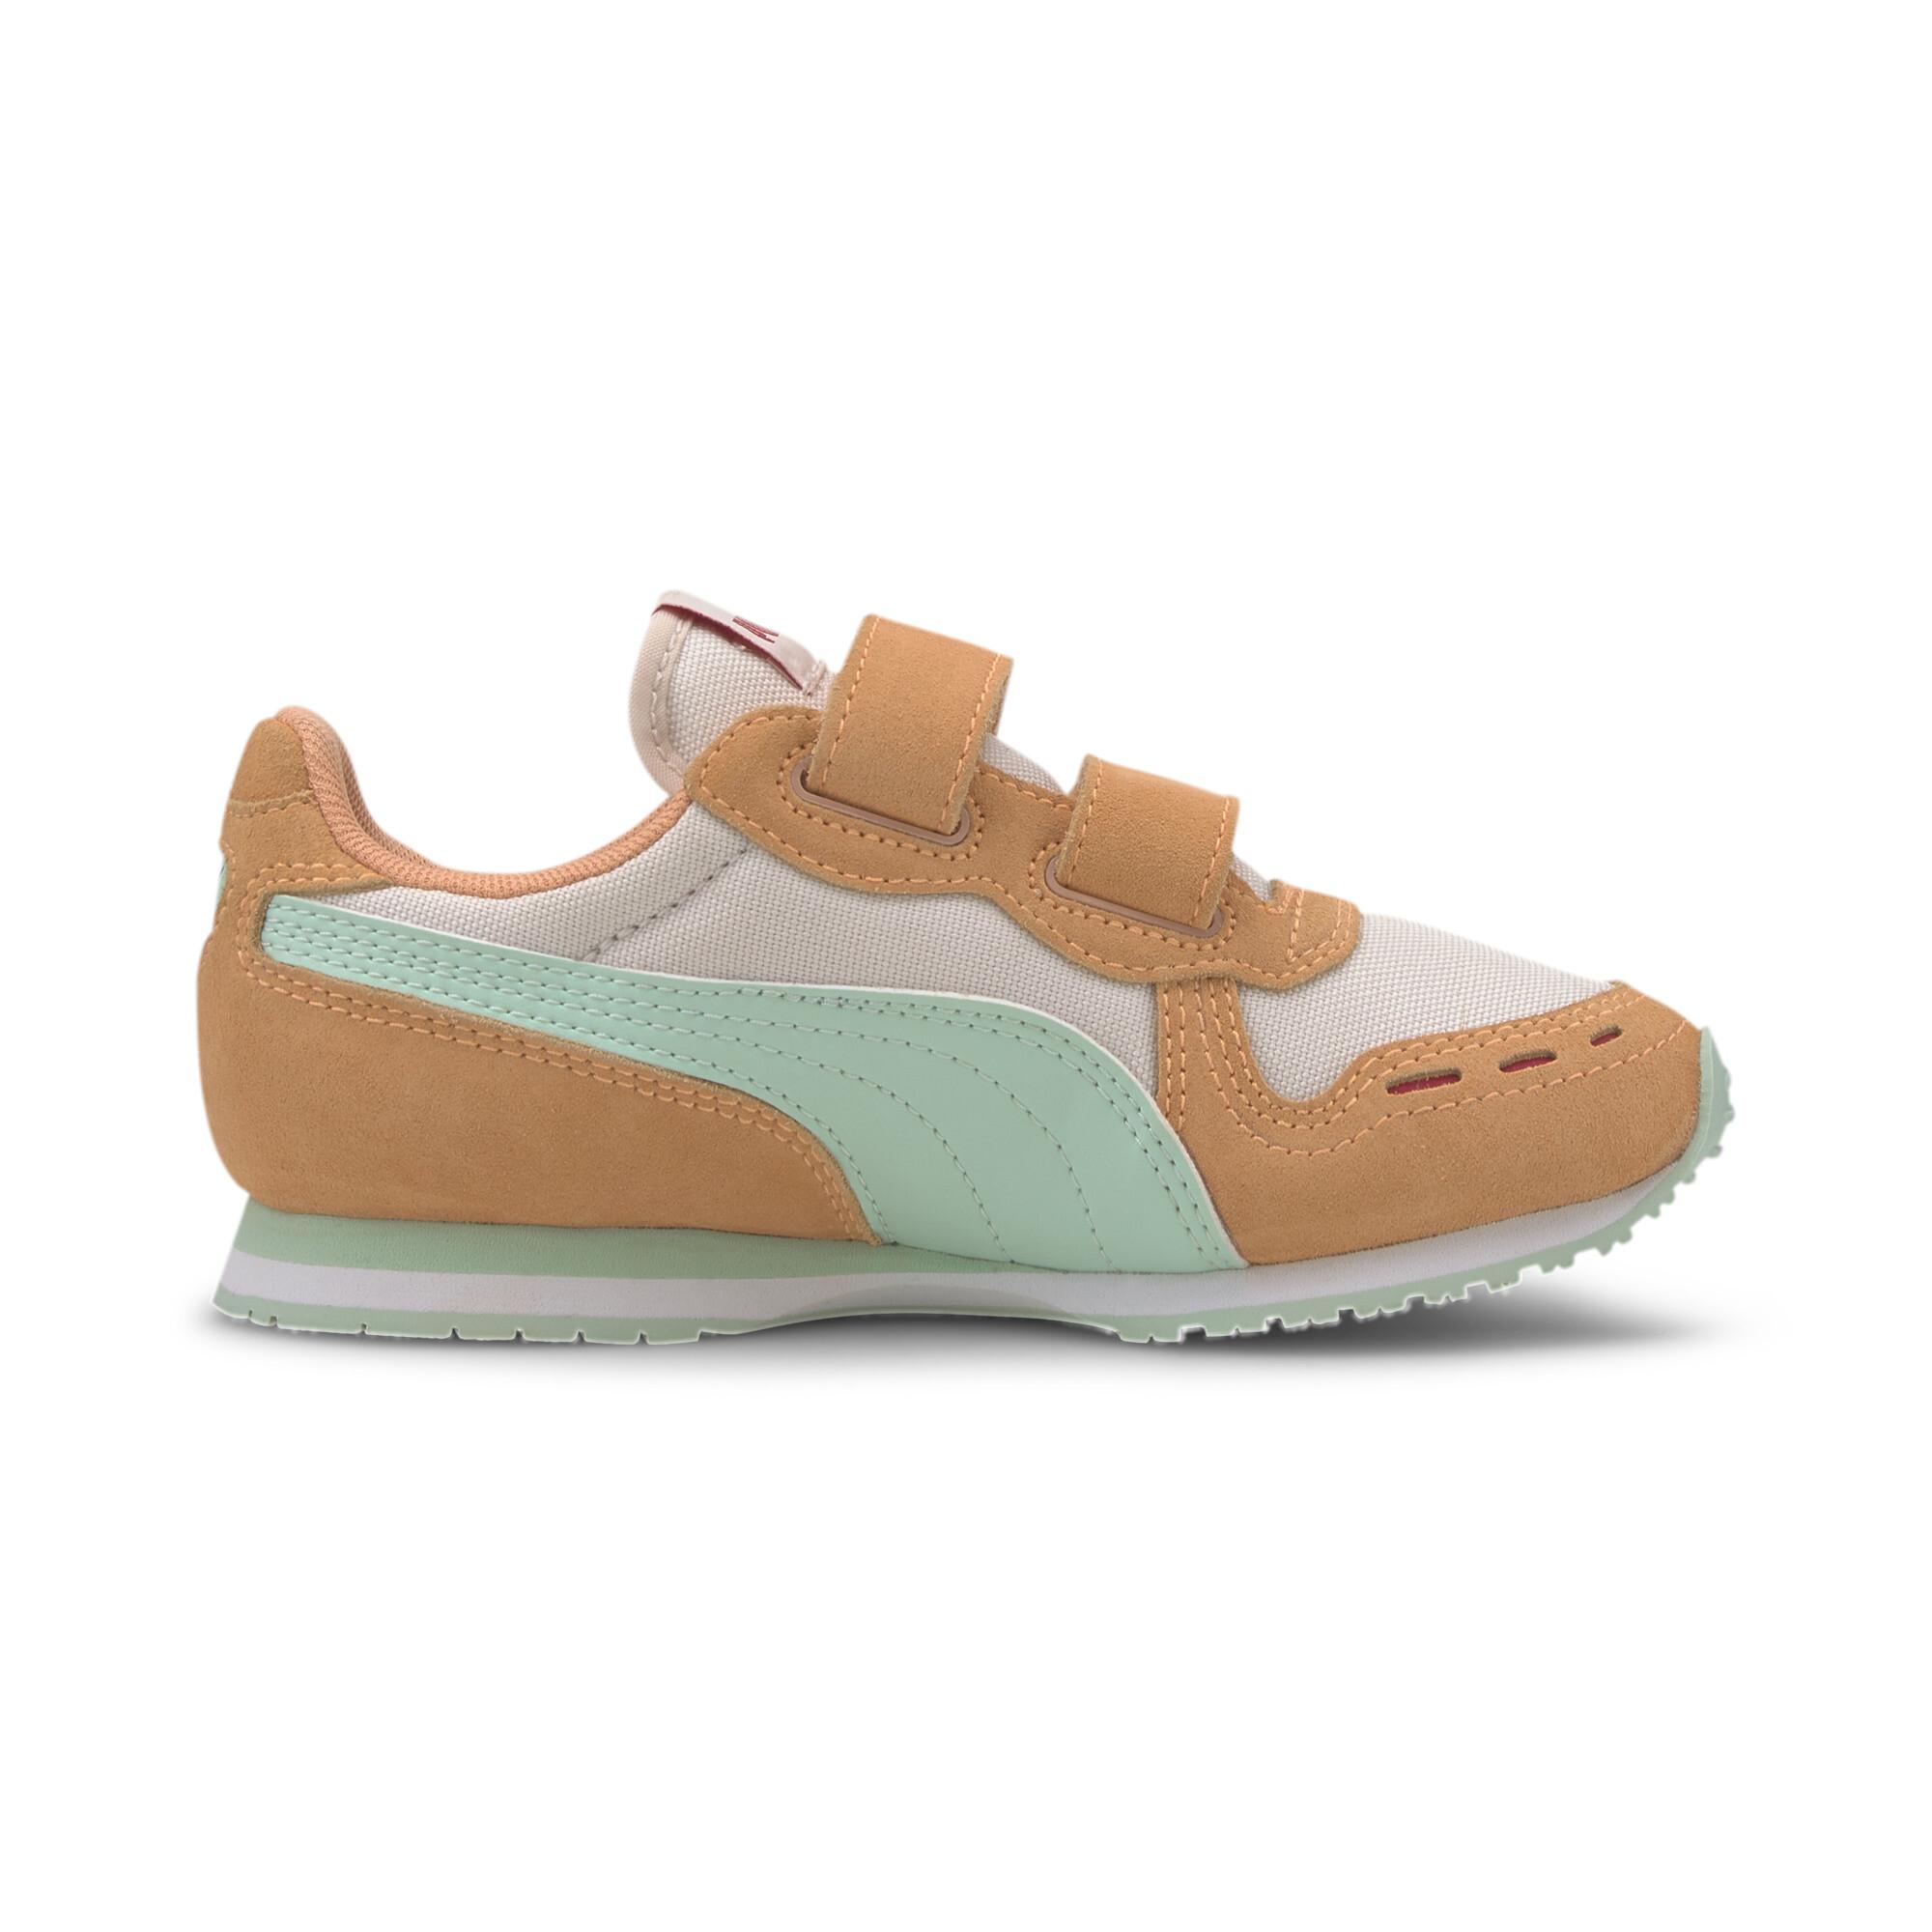 PUMA-Cabana-Racer-Little-Kids-039-Shoes-Kids-Shoe-Kids thumbnail 23